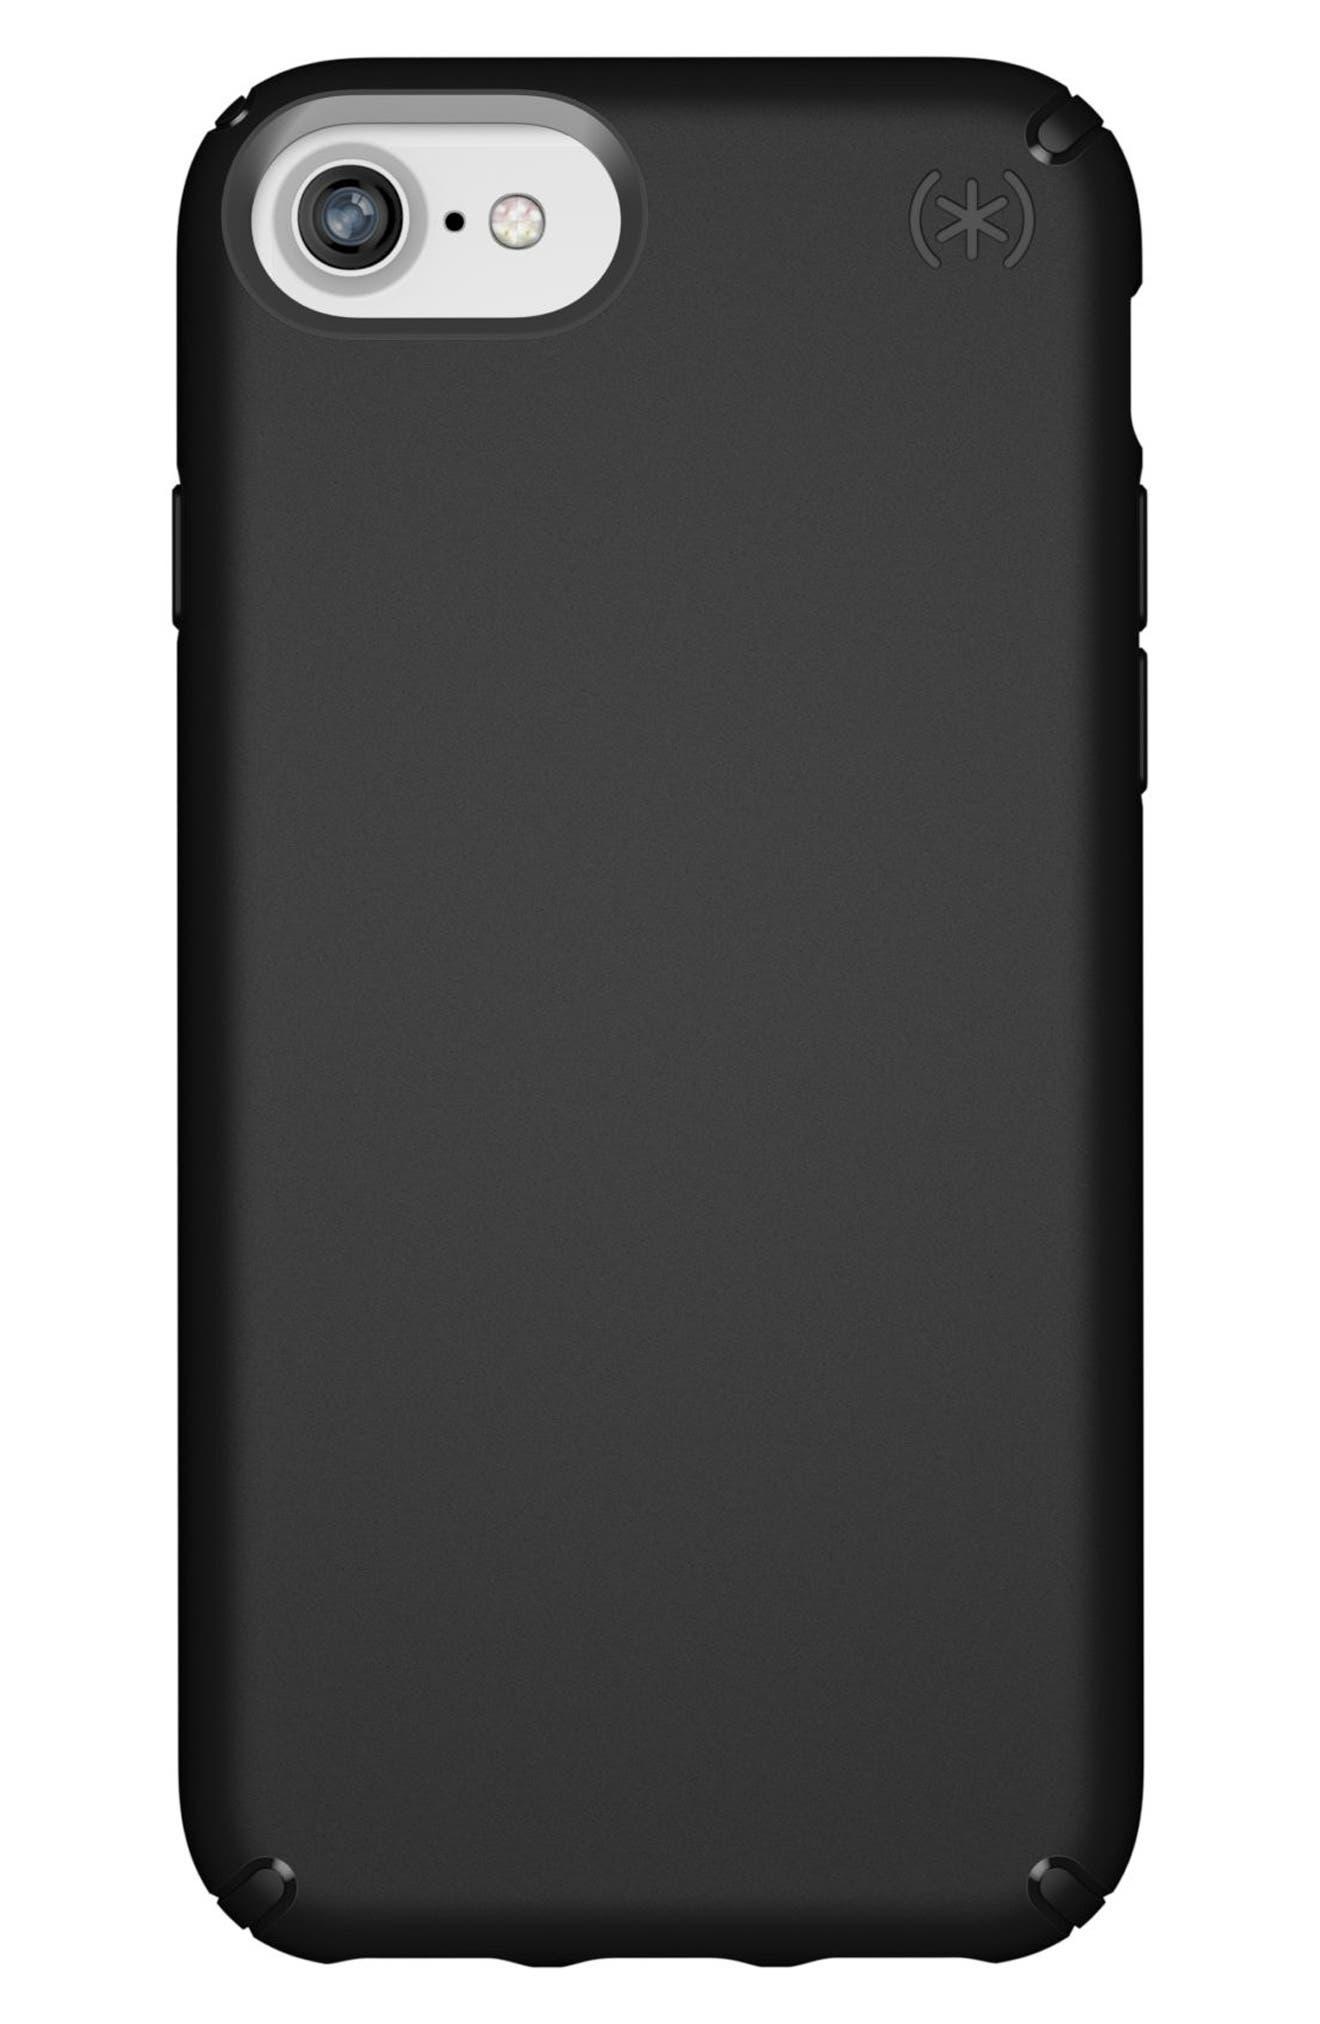 iPhone 6/6s/7/8 Case,                         Main,                         color, Black/ Black